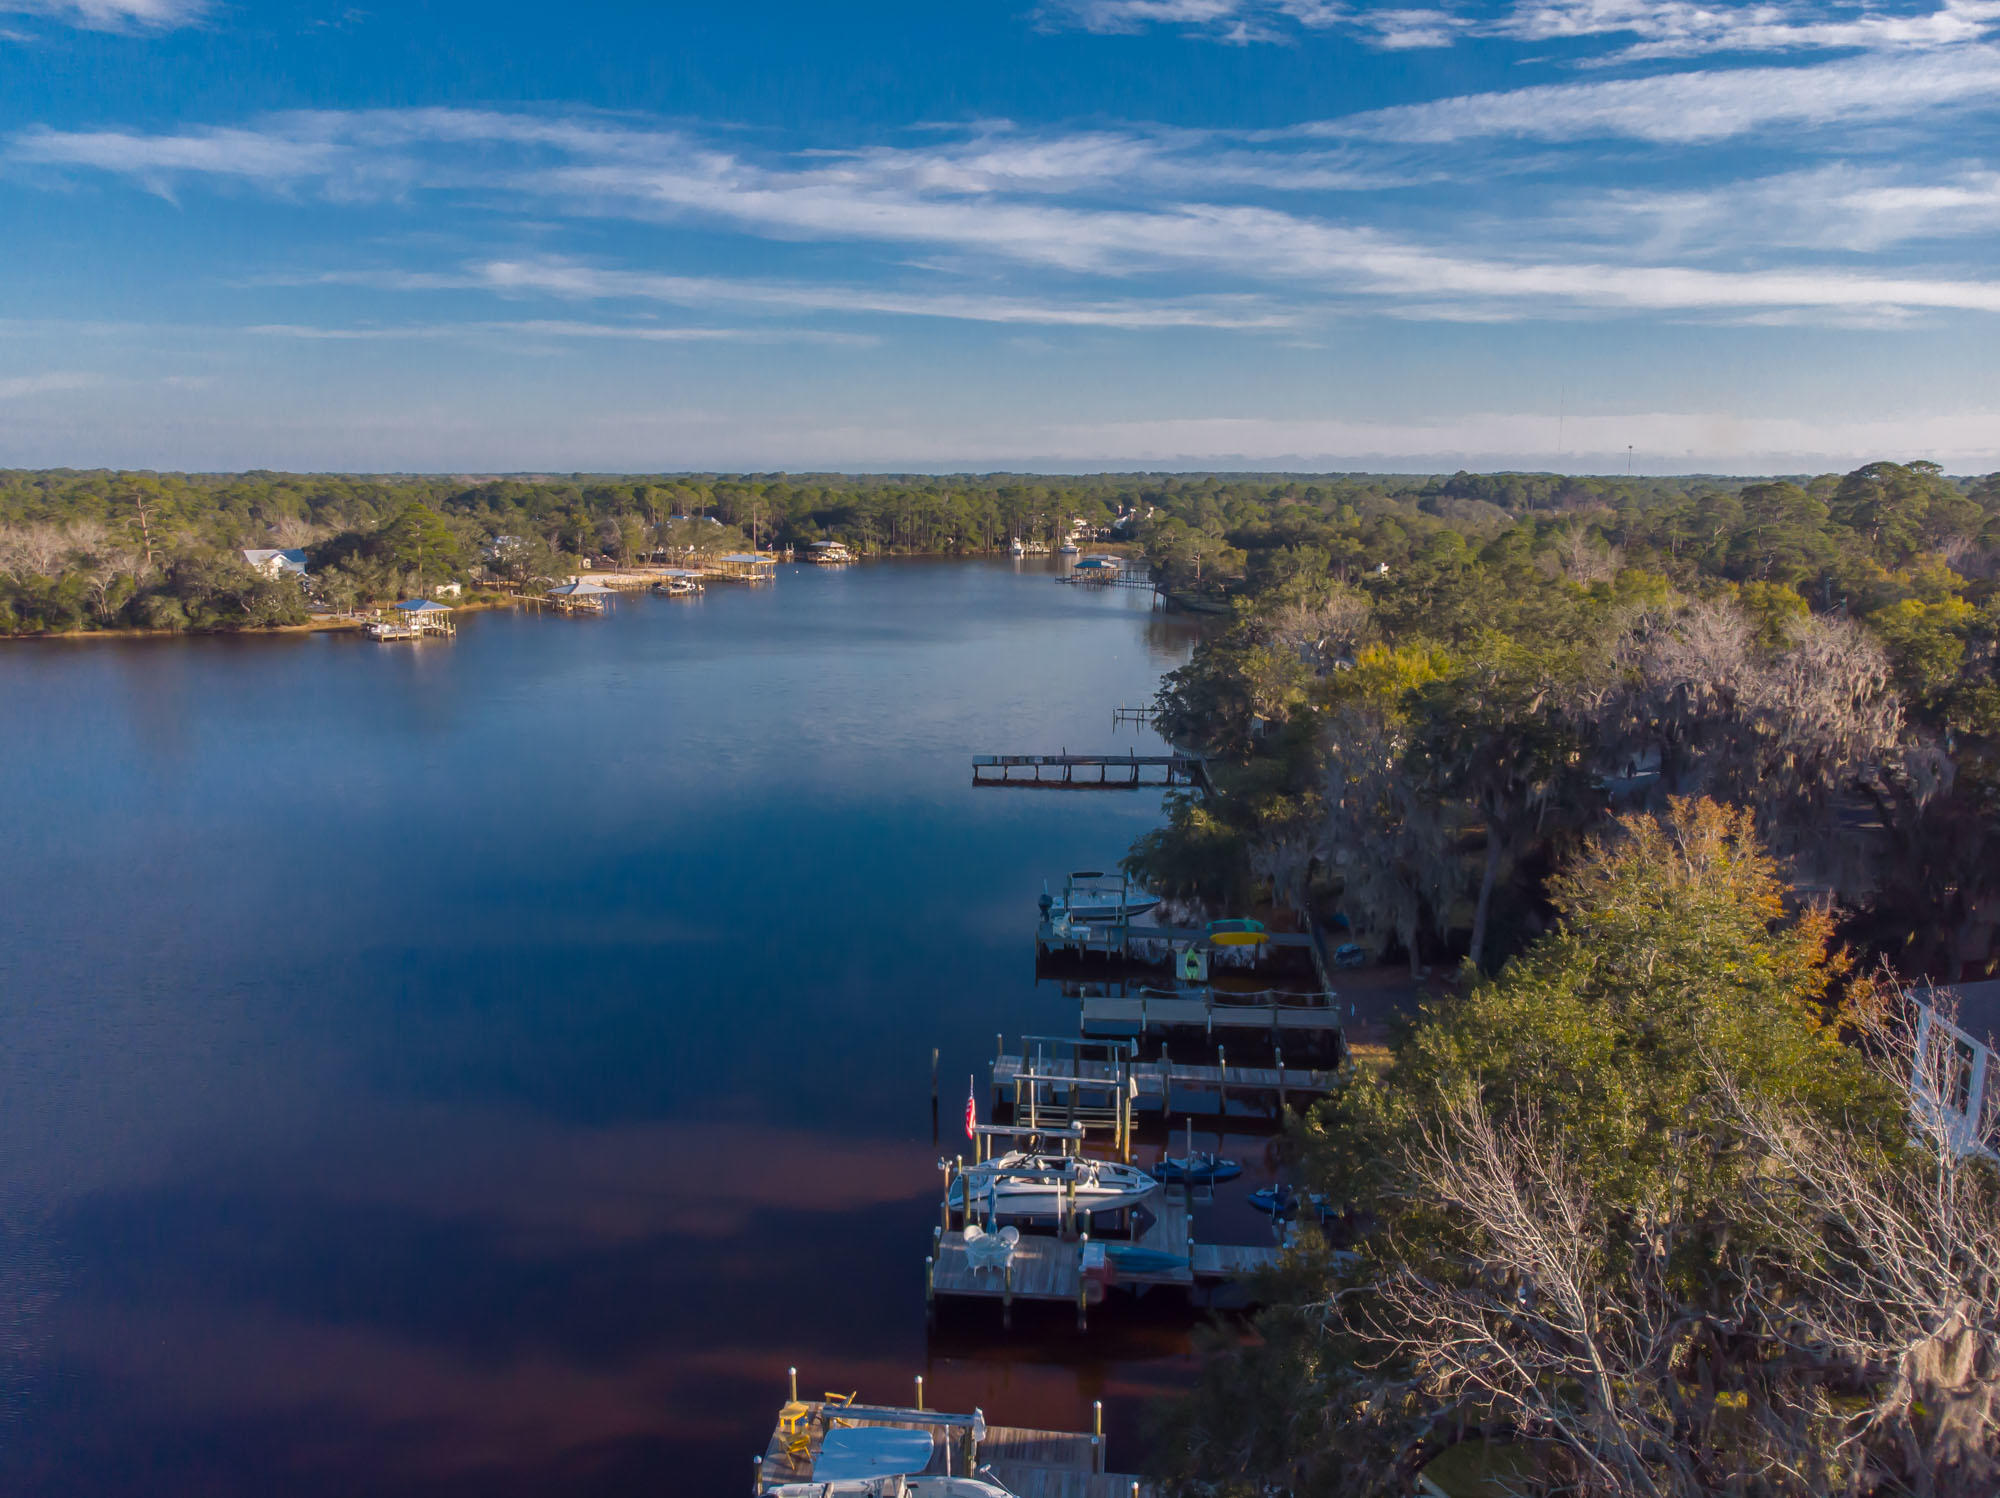 Lot 20 Drone Photos Sacred Oaks Mainsail